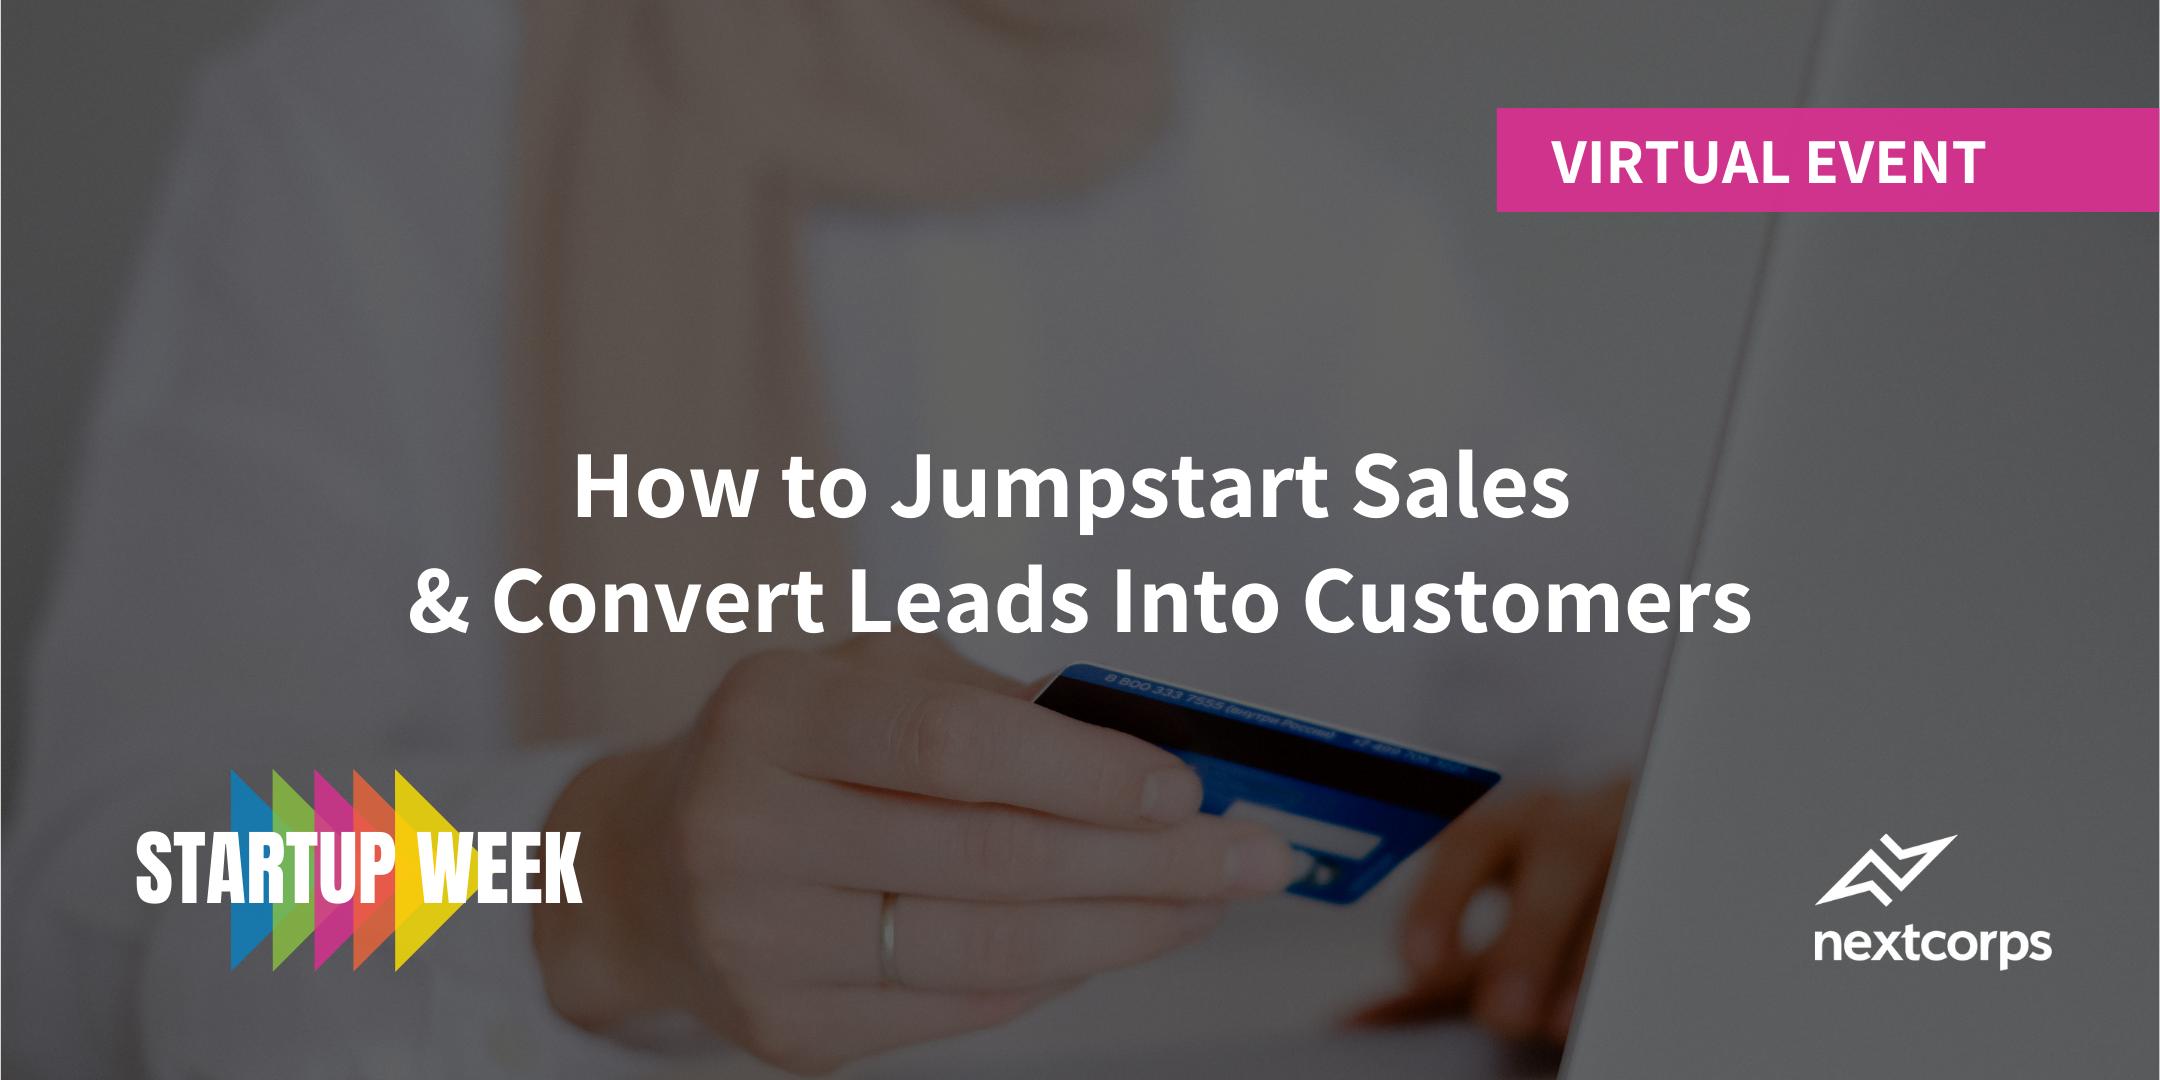 How to Jumpstart Sales